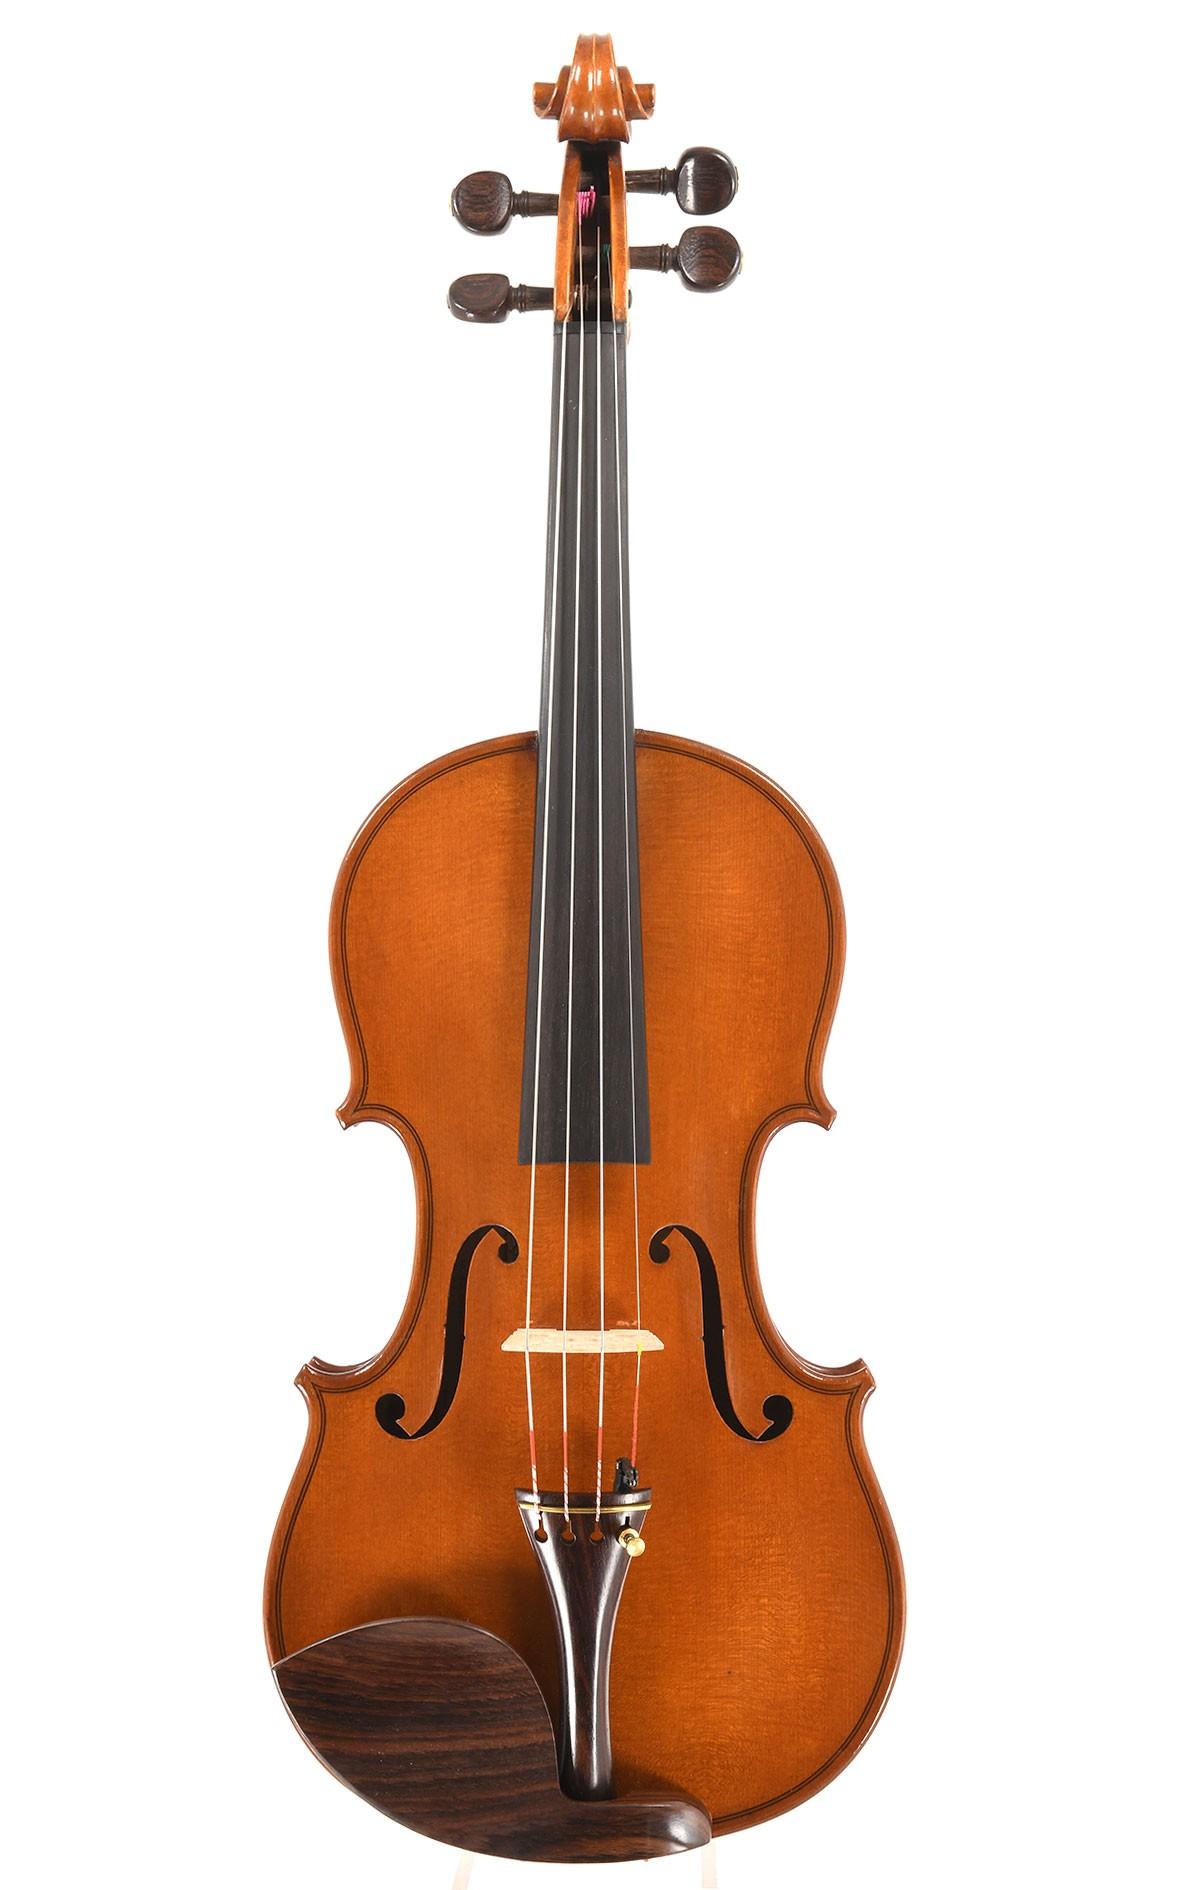 French violin by René Jacquemin, 1942